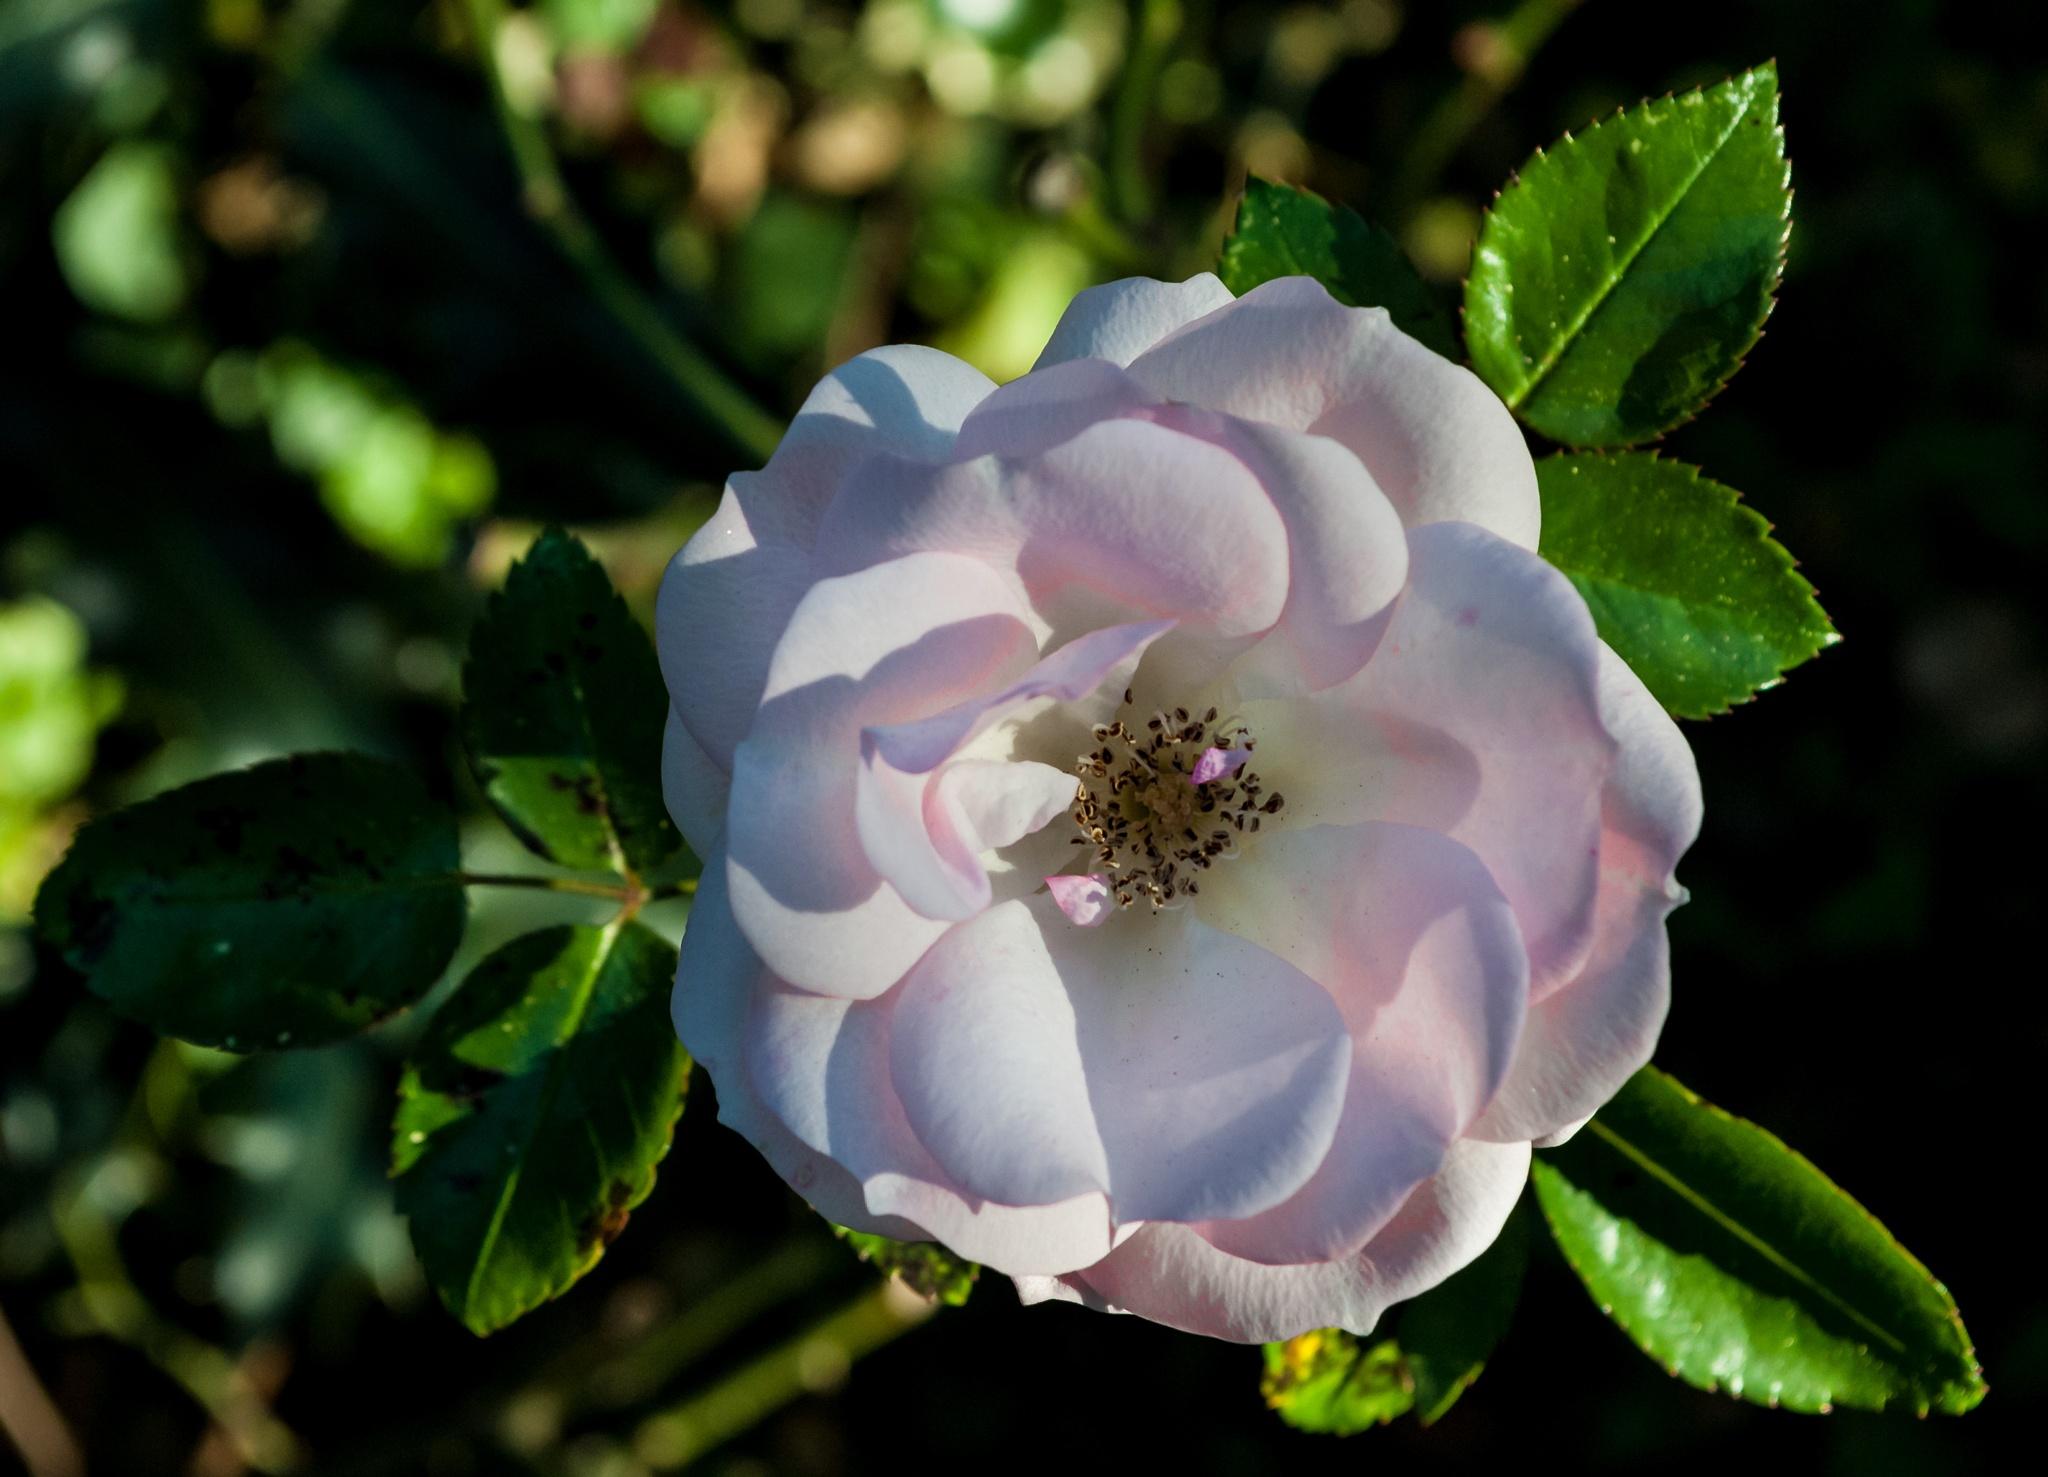 A rose by Mauro Gigli